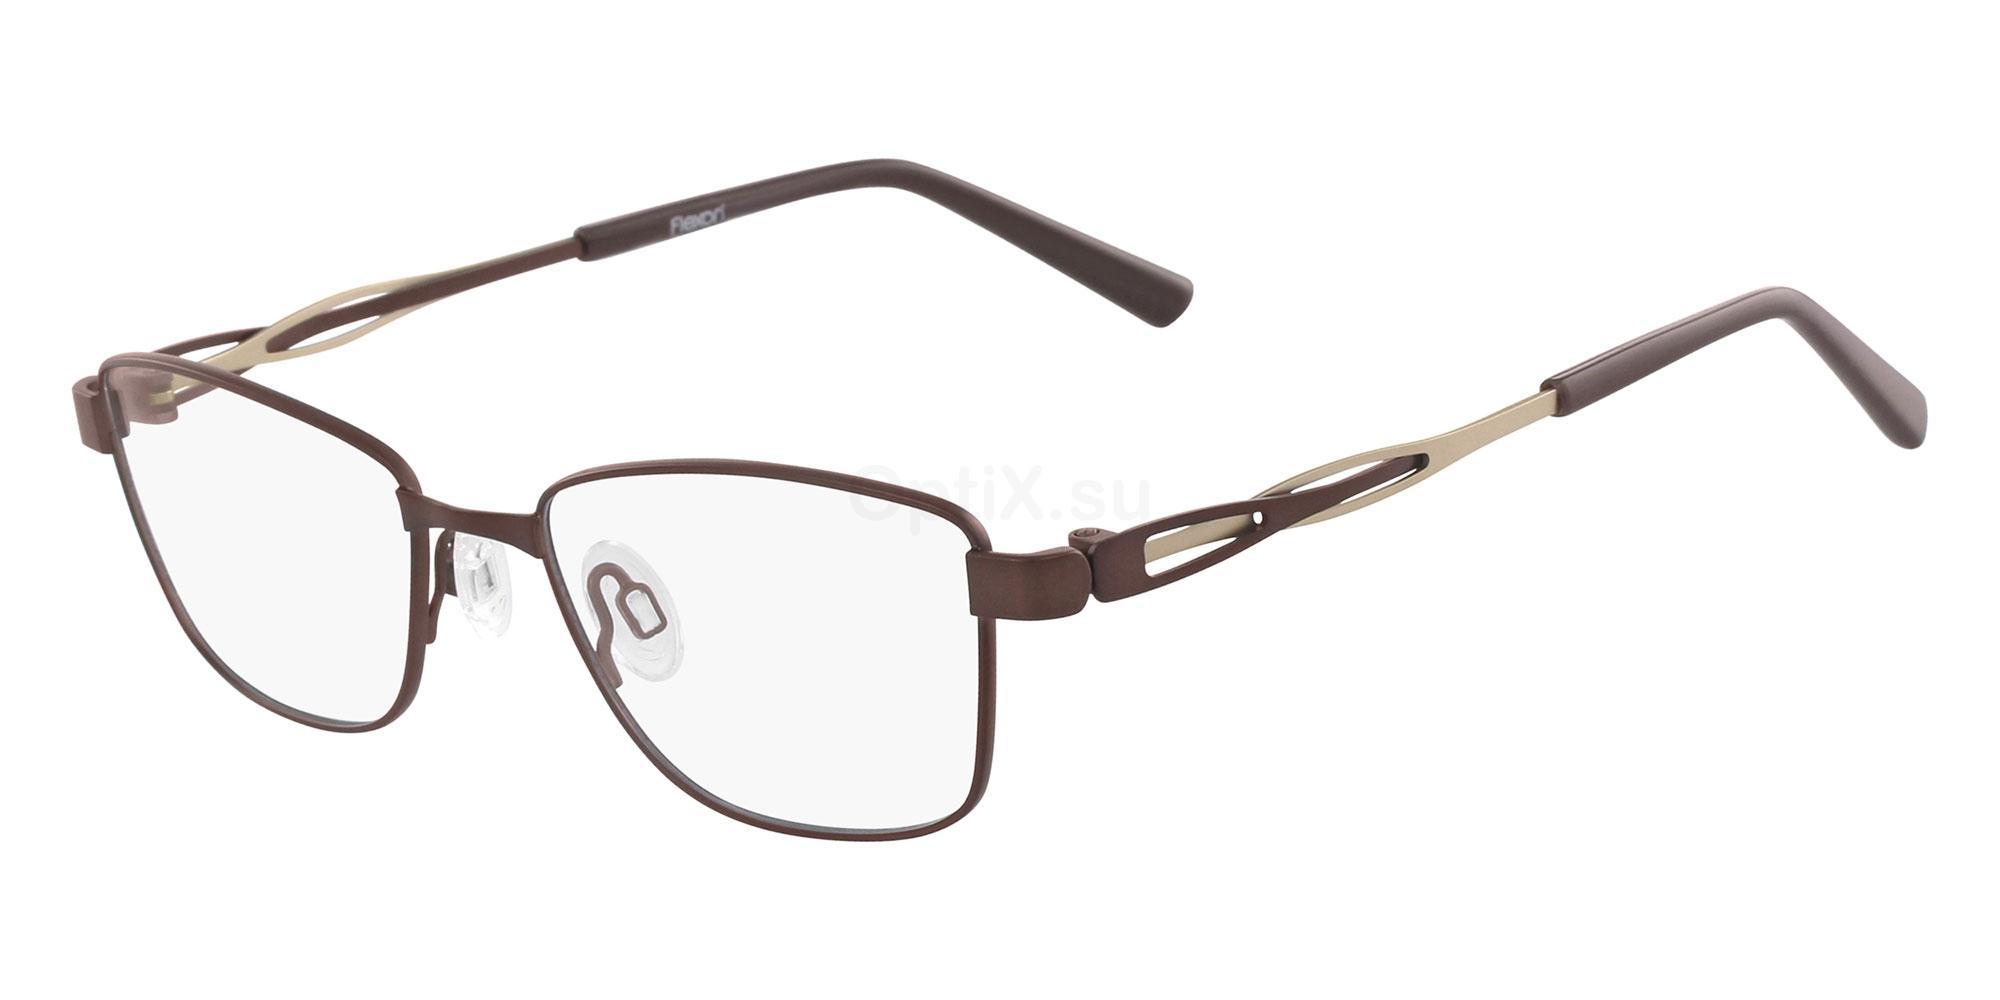 210 FLEXON VIVIEN Glasses, Flexon